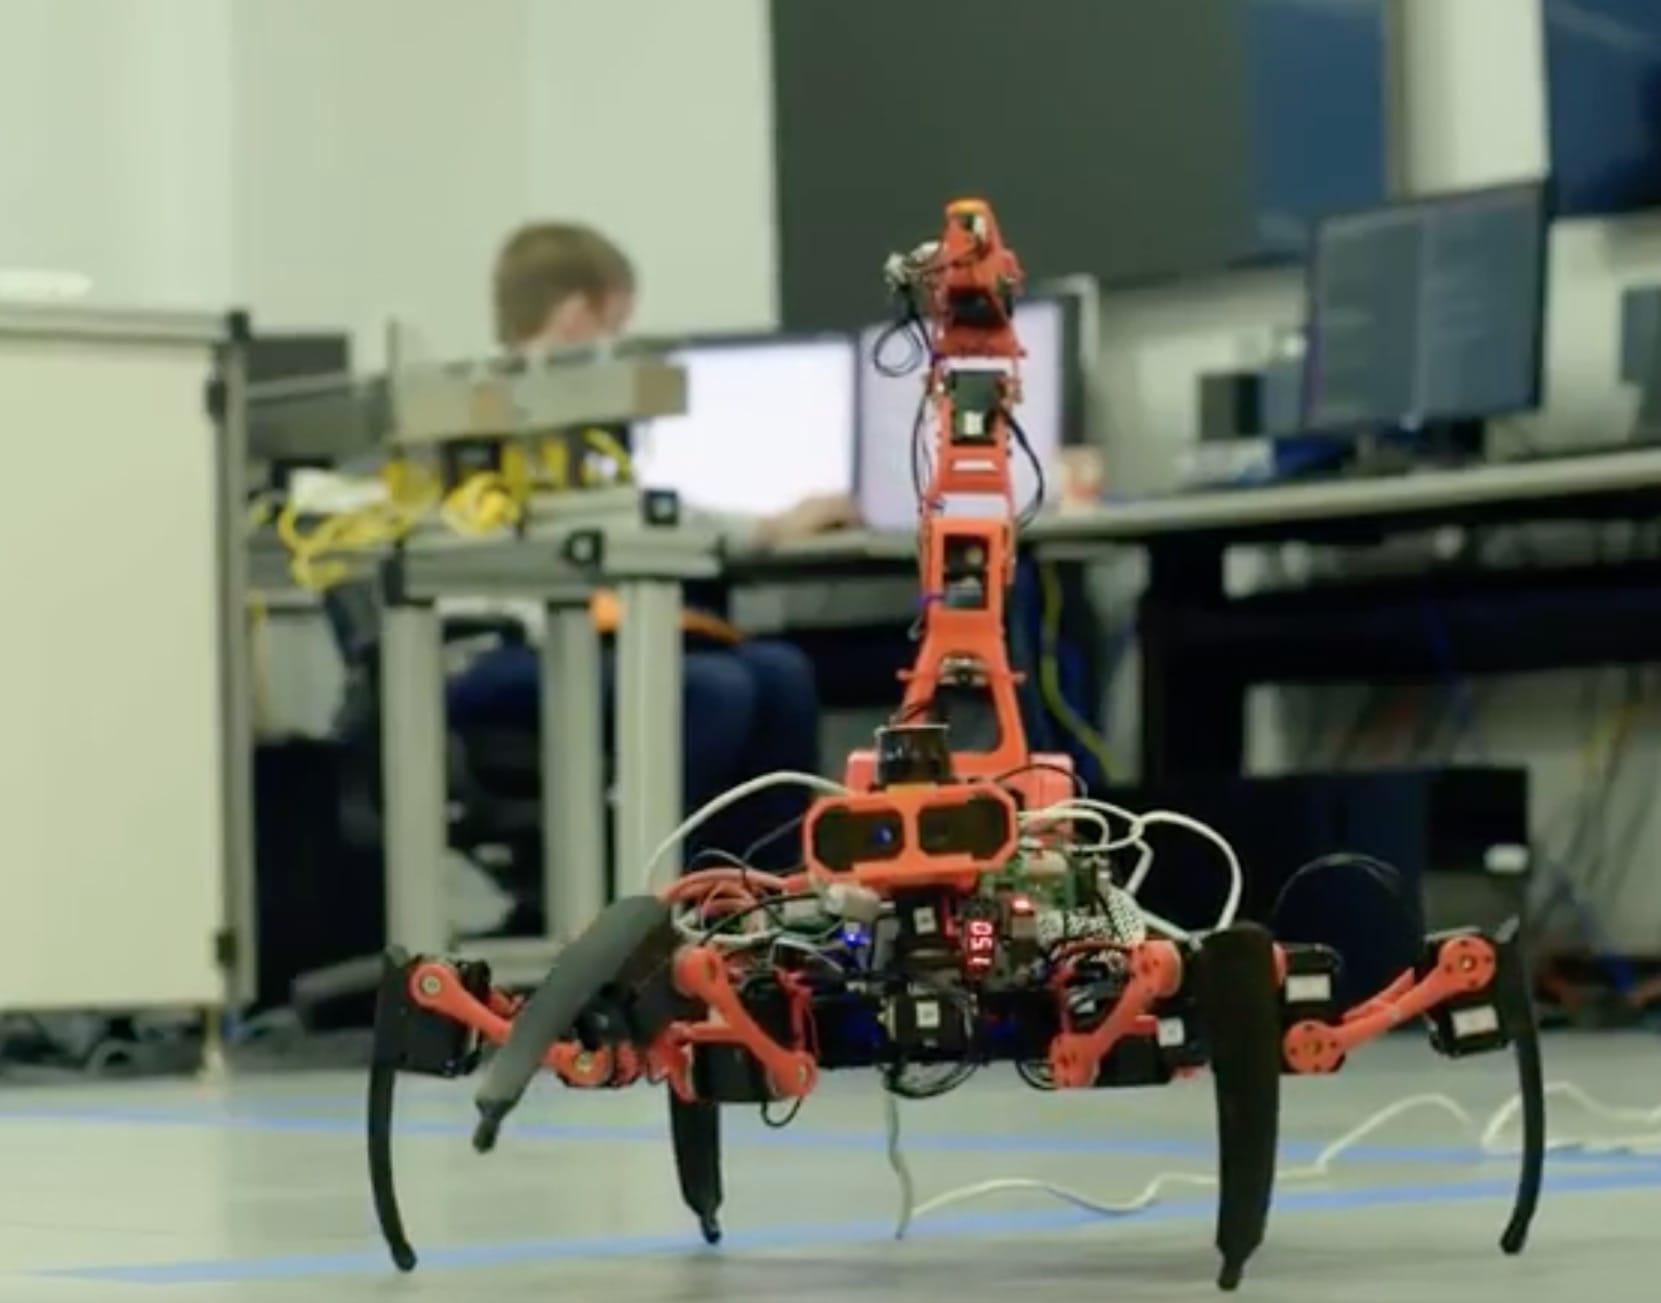 Siemens' experimental 3D printing robot on the shop floor